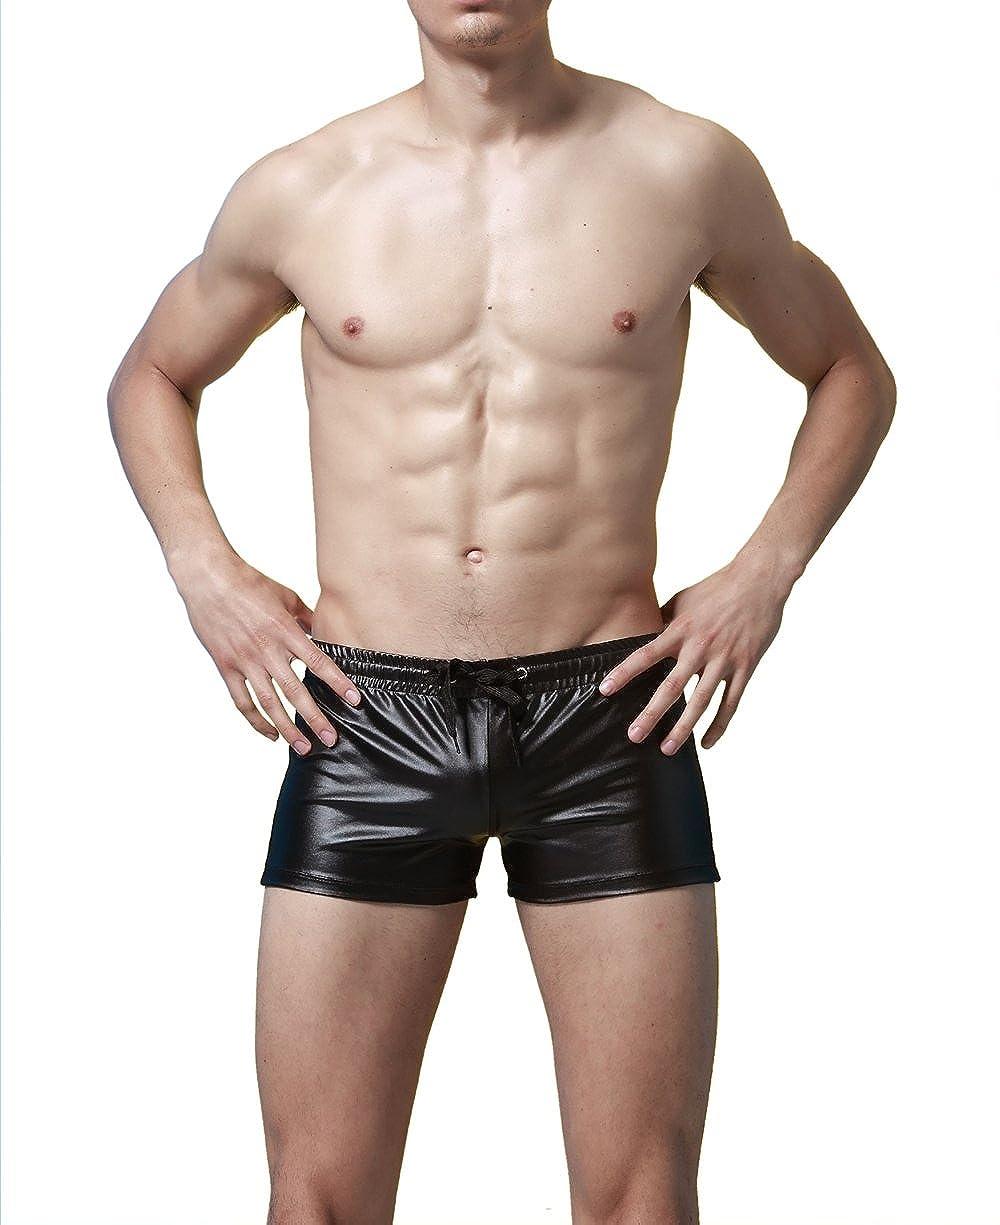 FR Mens Faux Leather Insurgent Swimwear Trunks Boxer Shorts Underwear Black Medium FR074B-Mpineiku